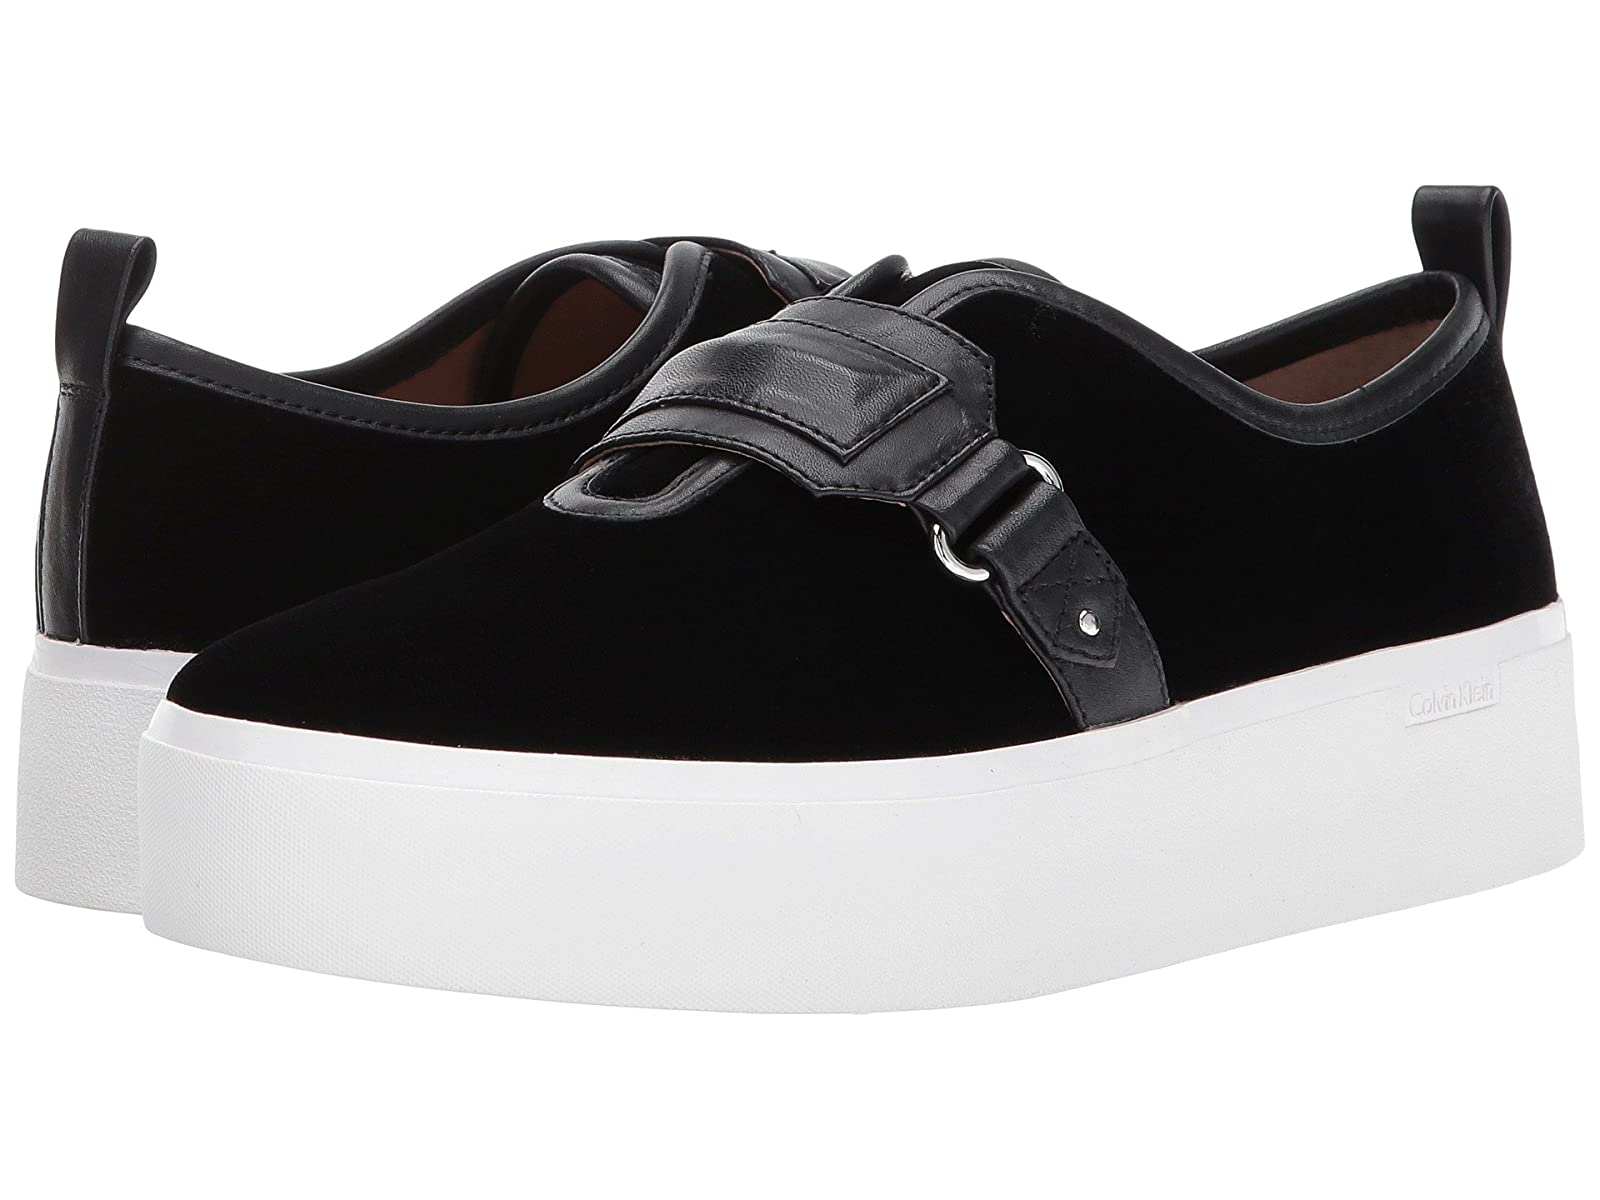 Calvin Klein JunoCheap and distinctive eye-catching shoes